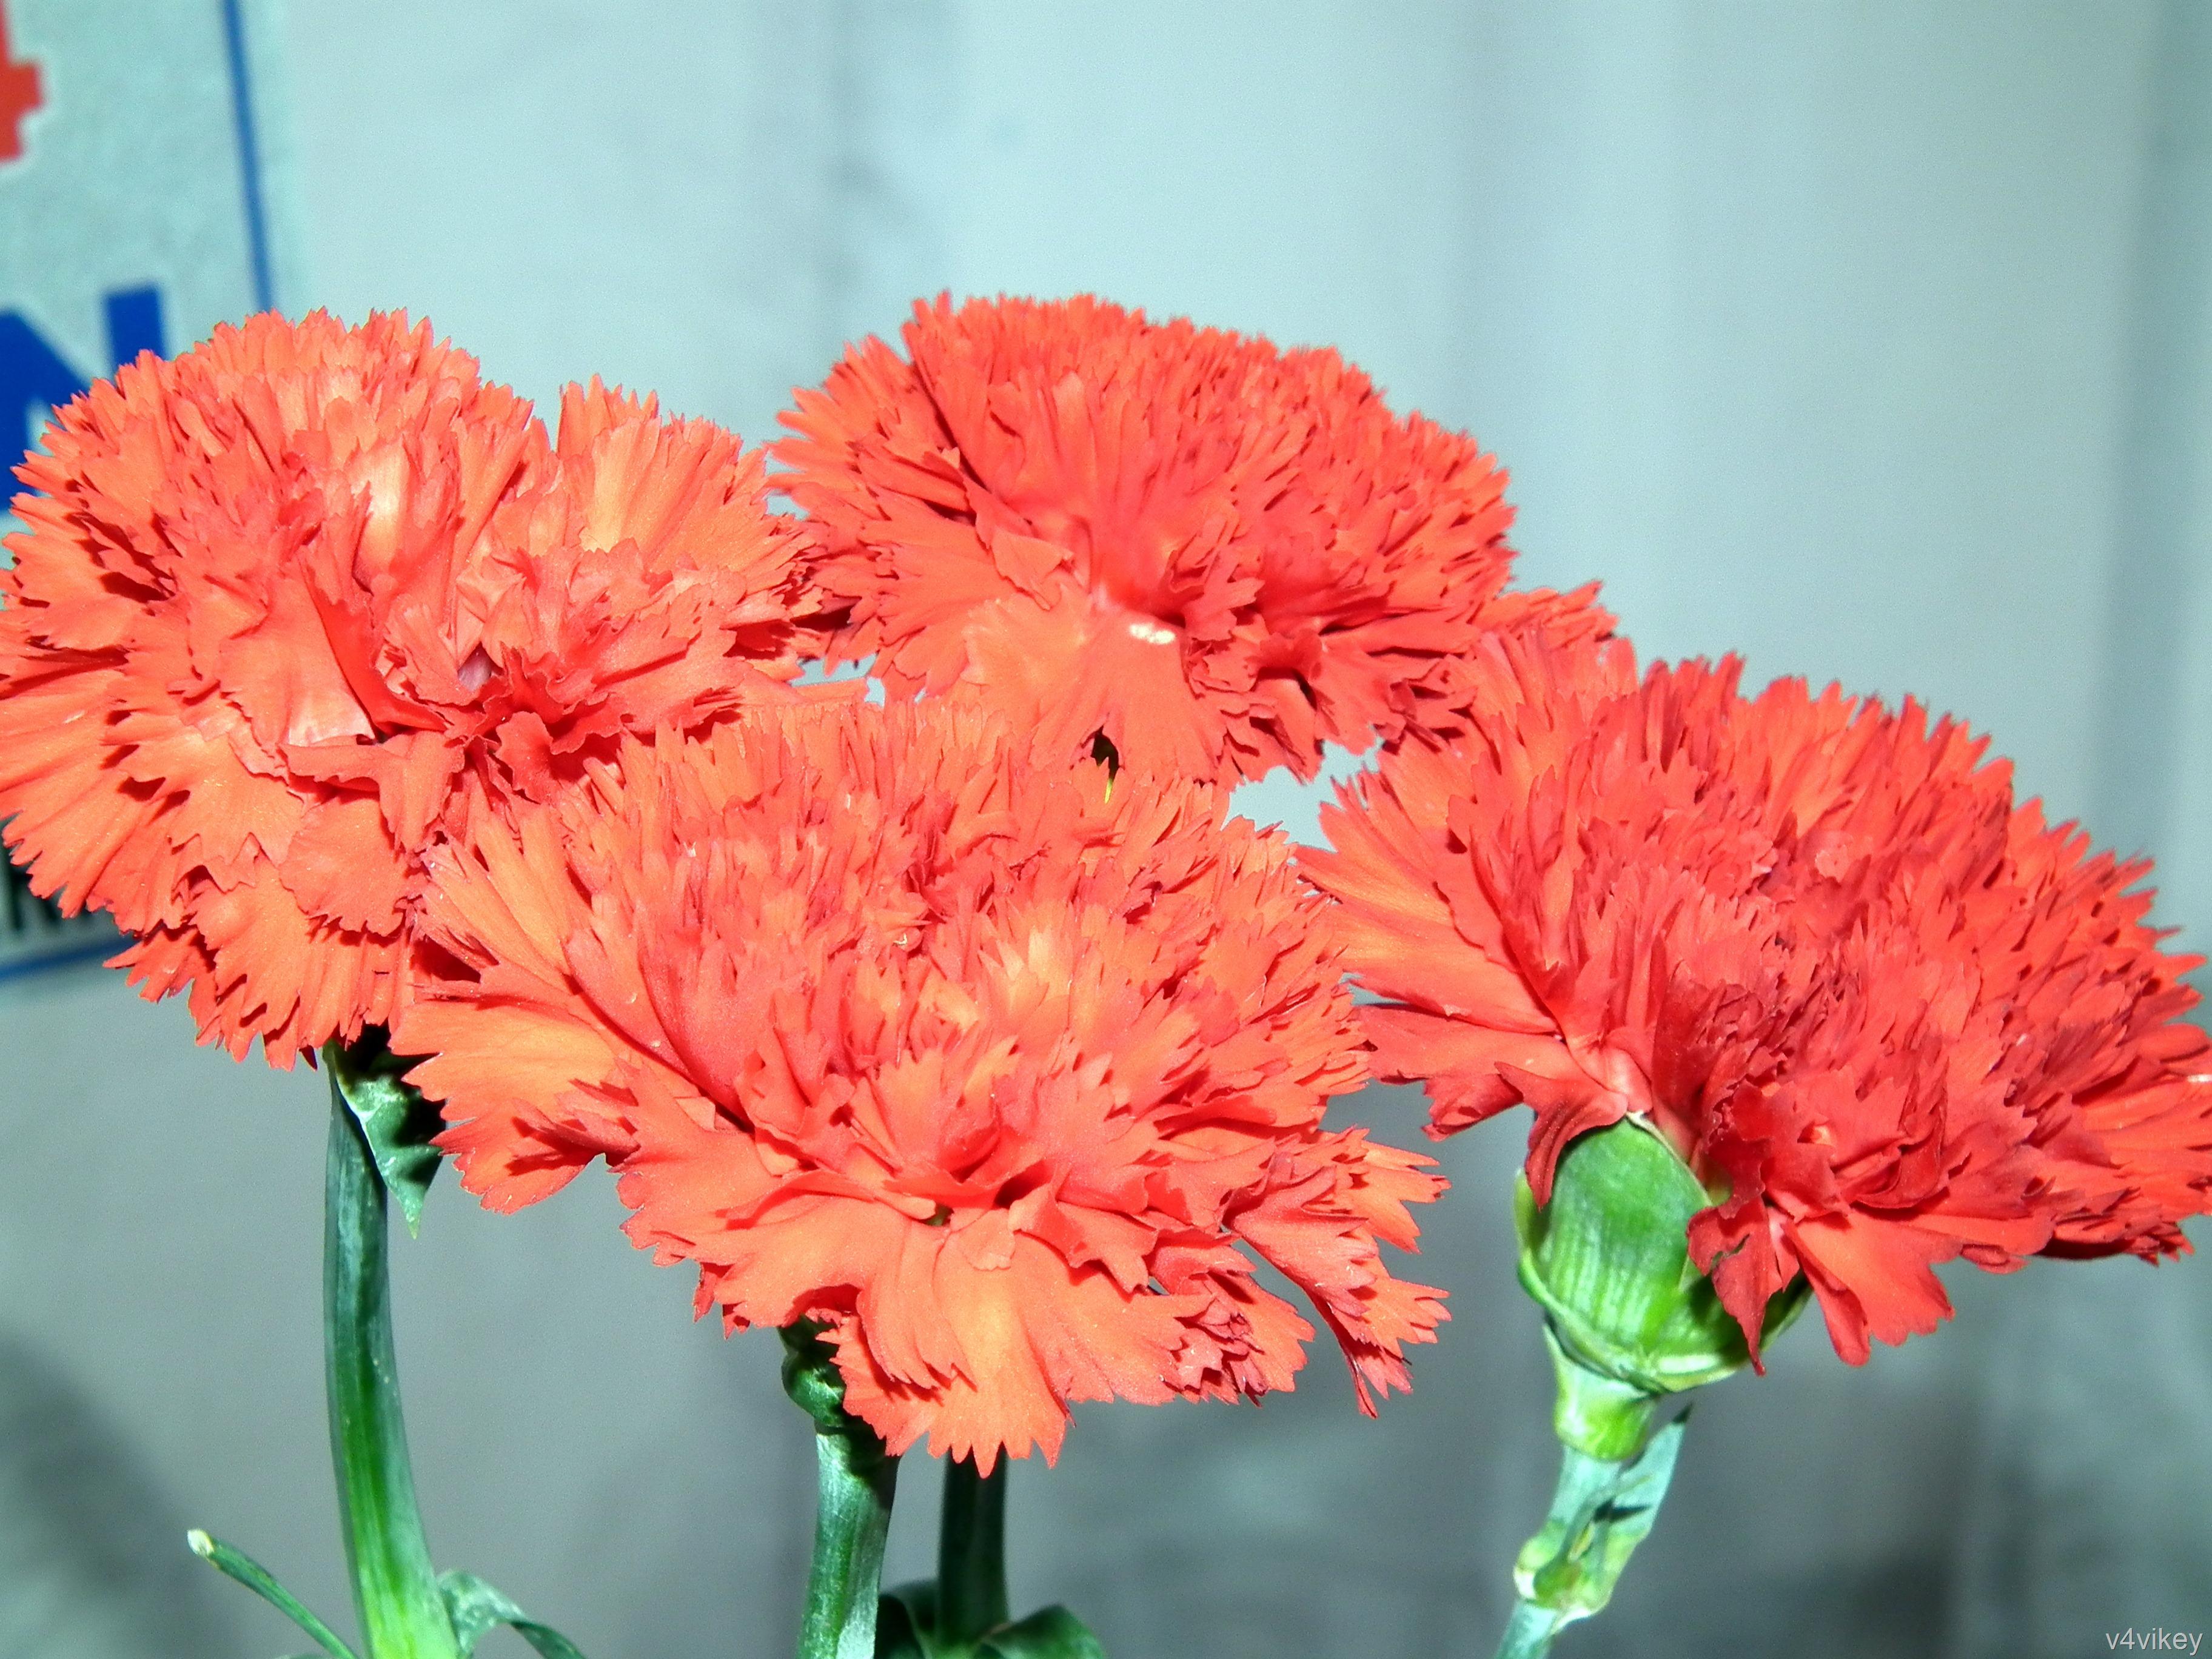 Red Carnation Flower Meaning « Wallpaper Tadka